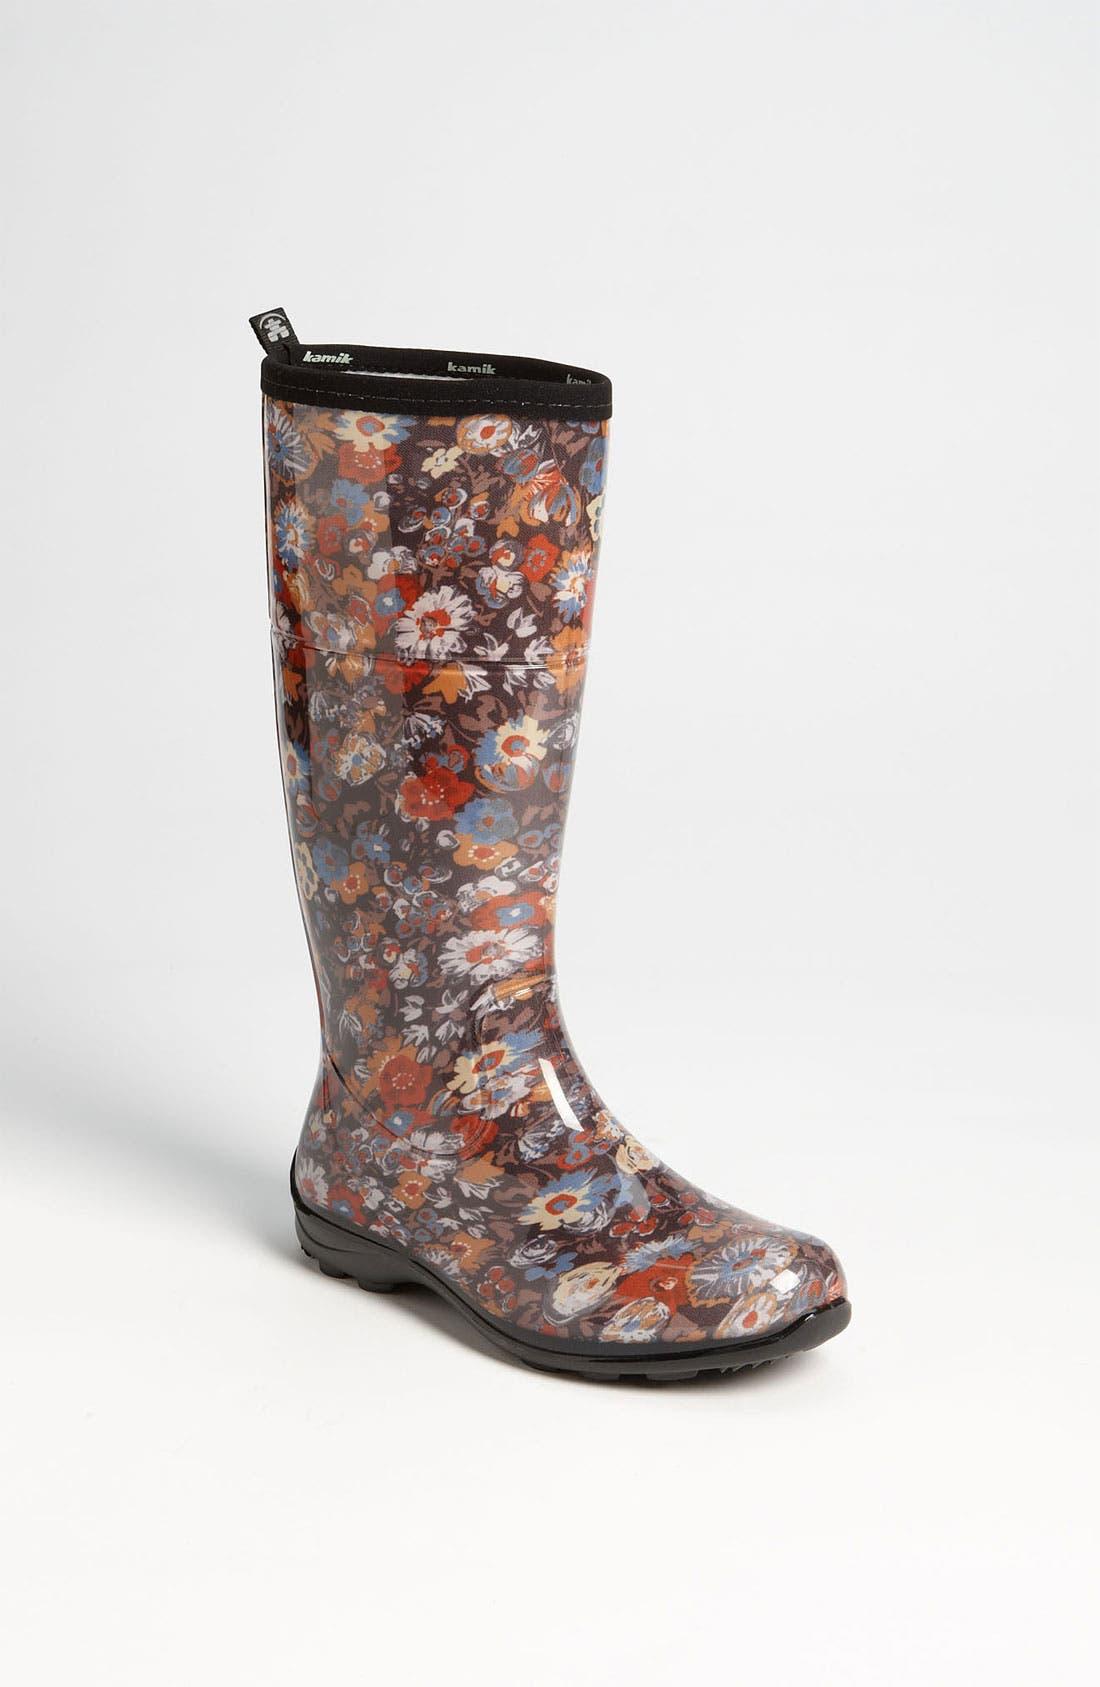 Alternate Image 1 Selected - Kamik 'Margo' Rain Boot (Women)